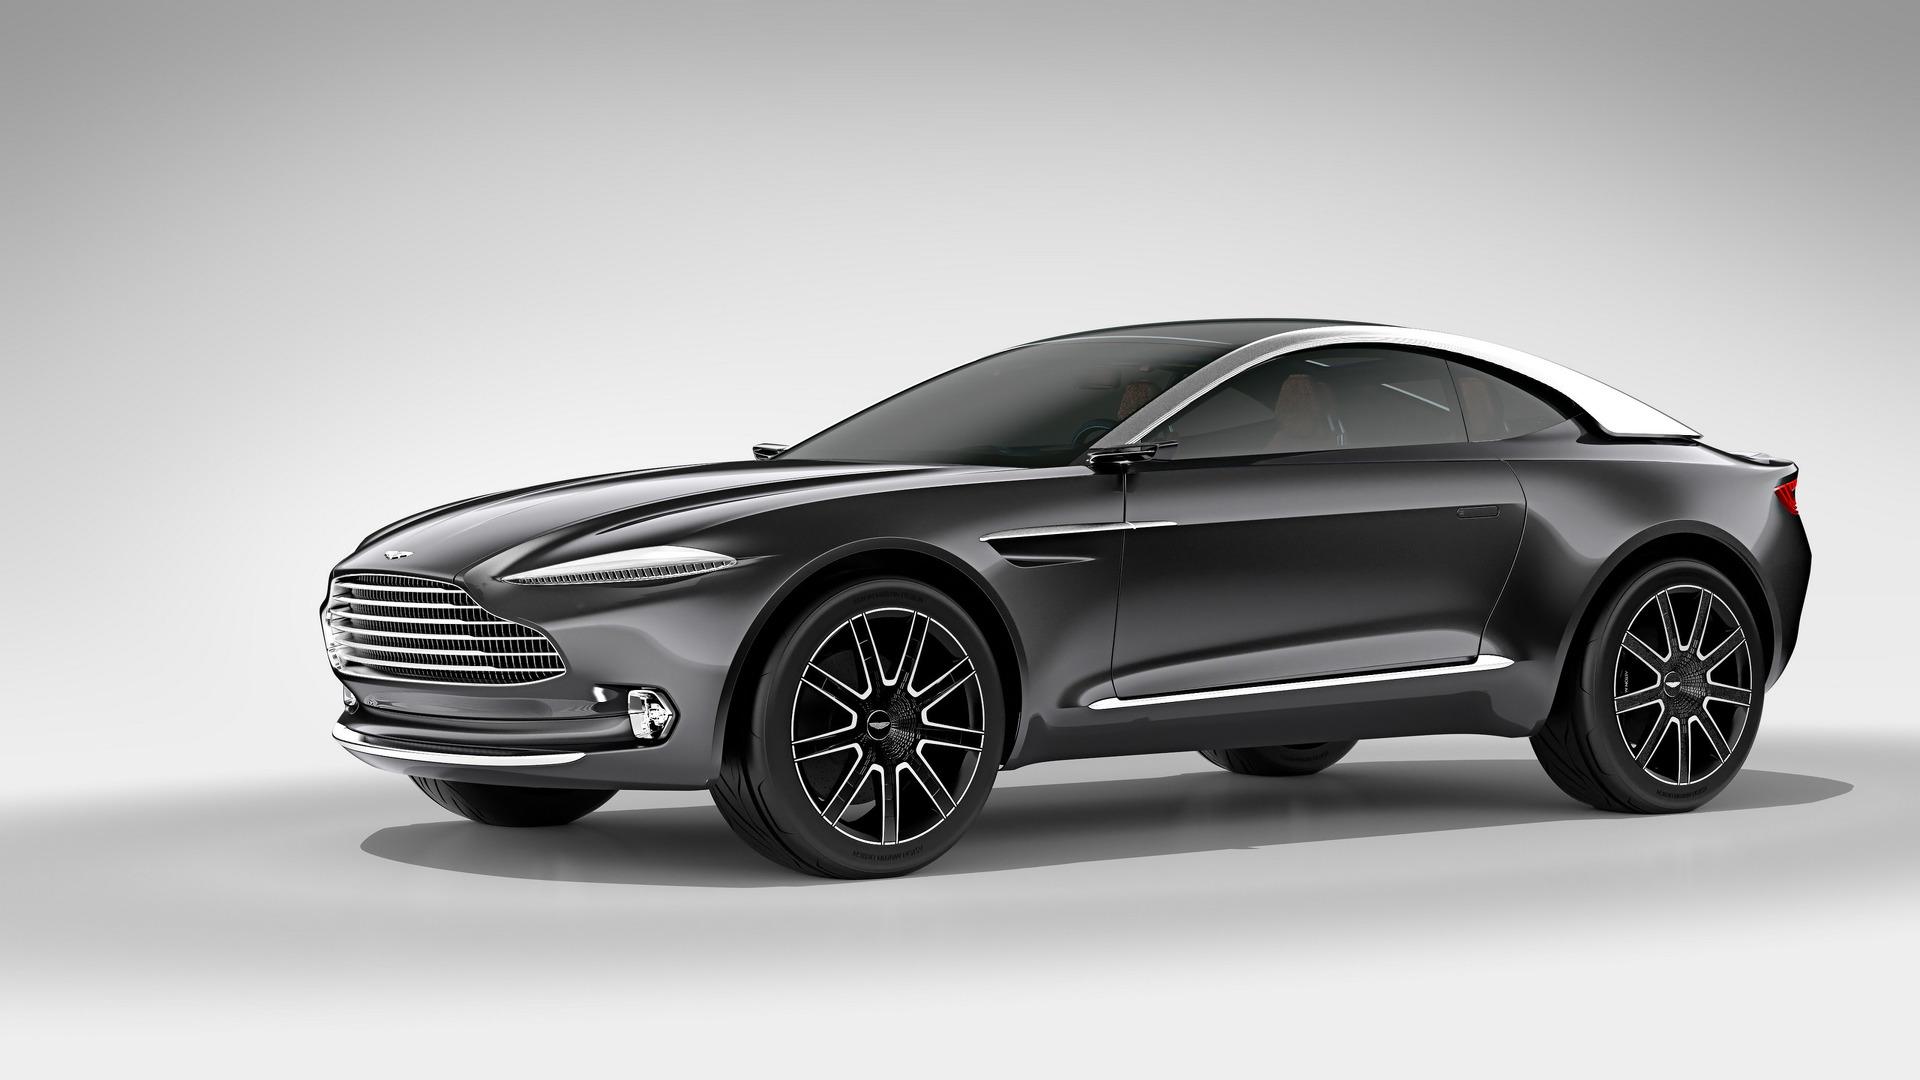 Aston Martin Varekai Suv To Be Powered Only By Gasoline Engine